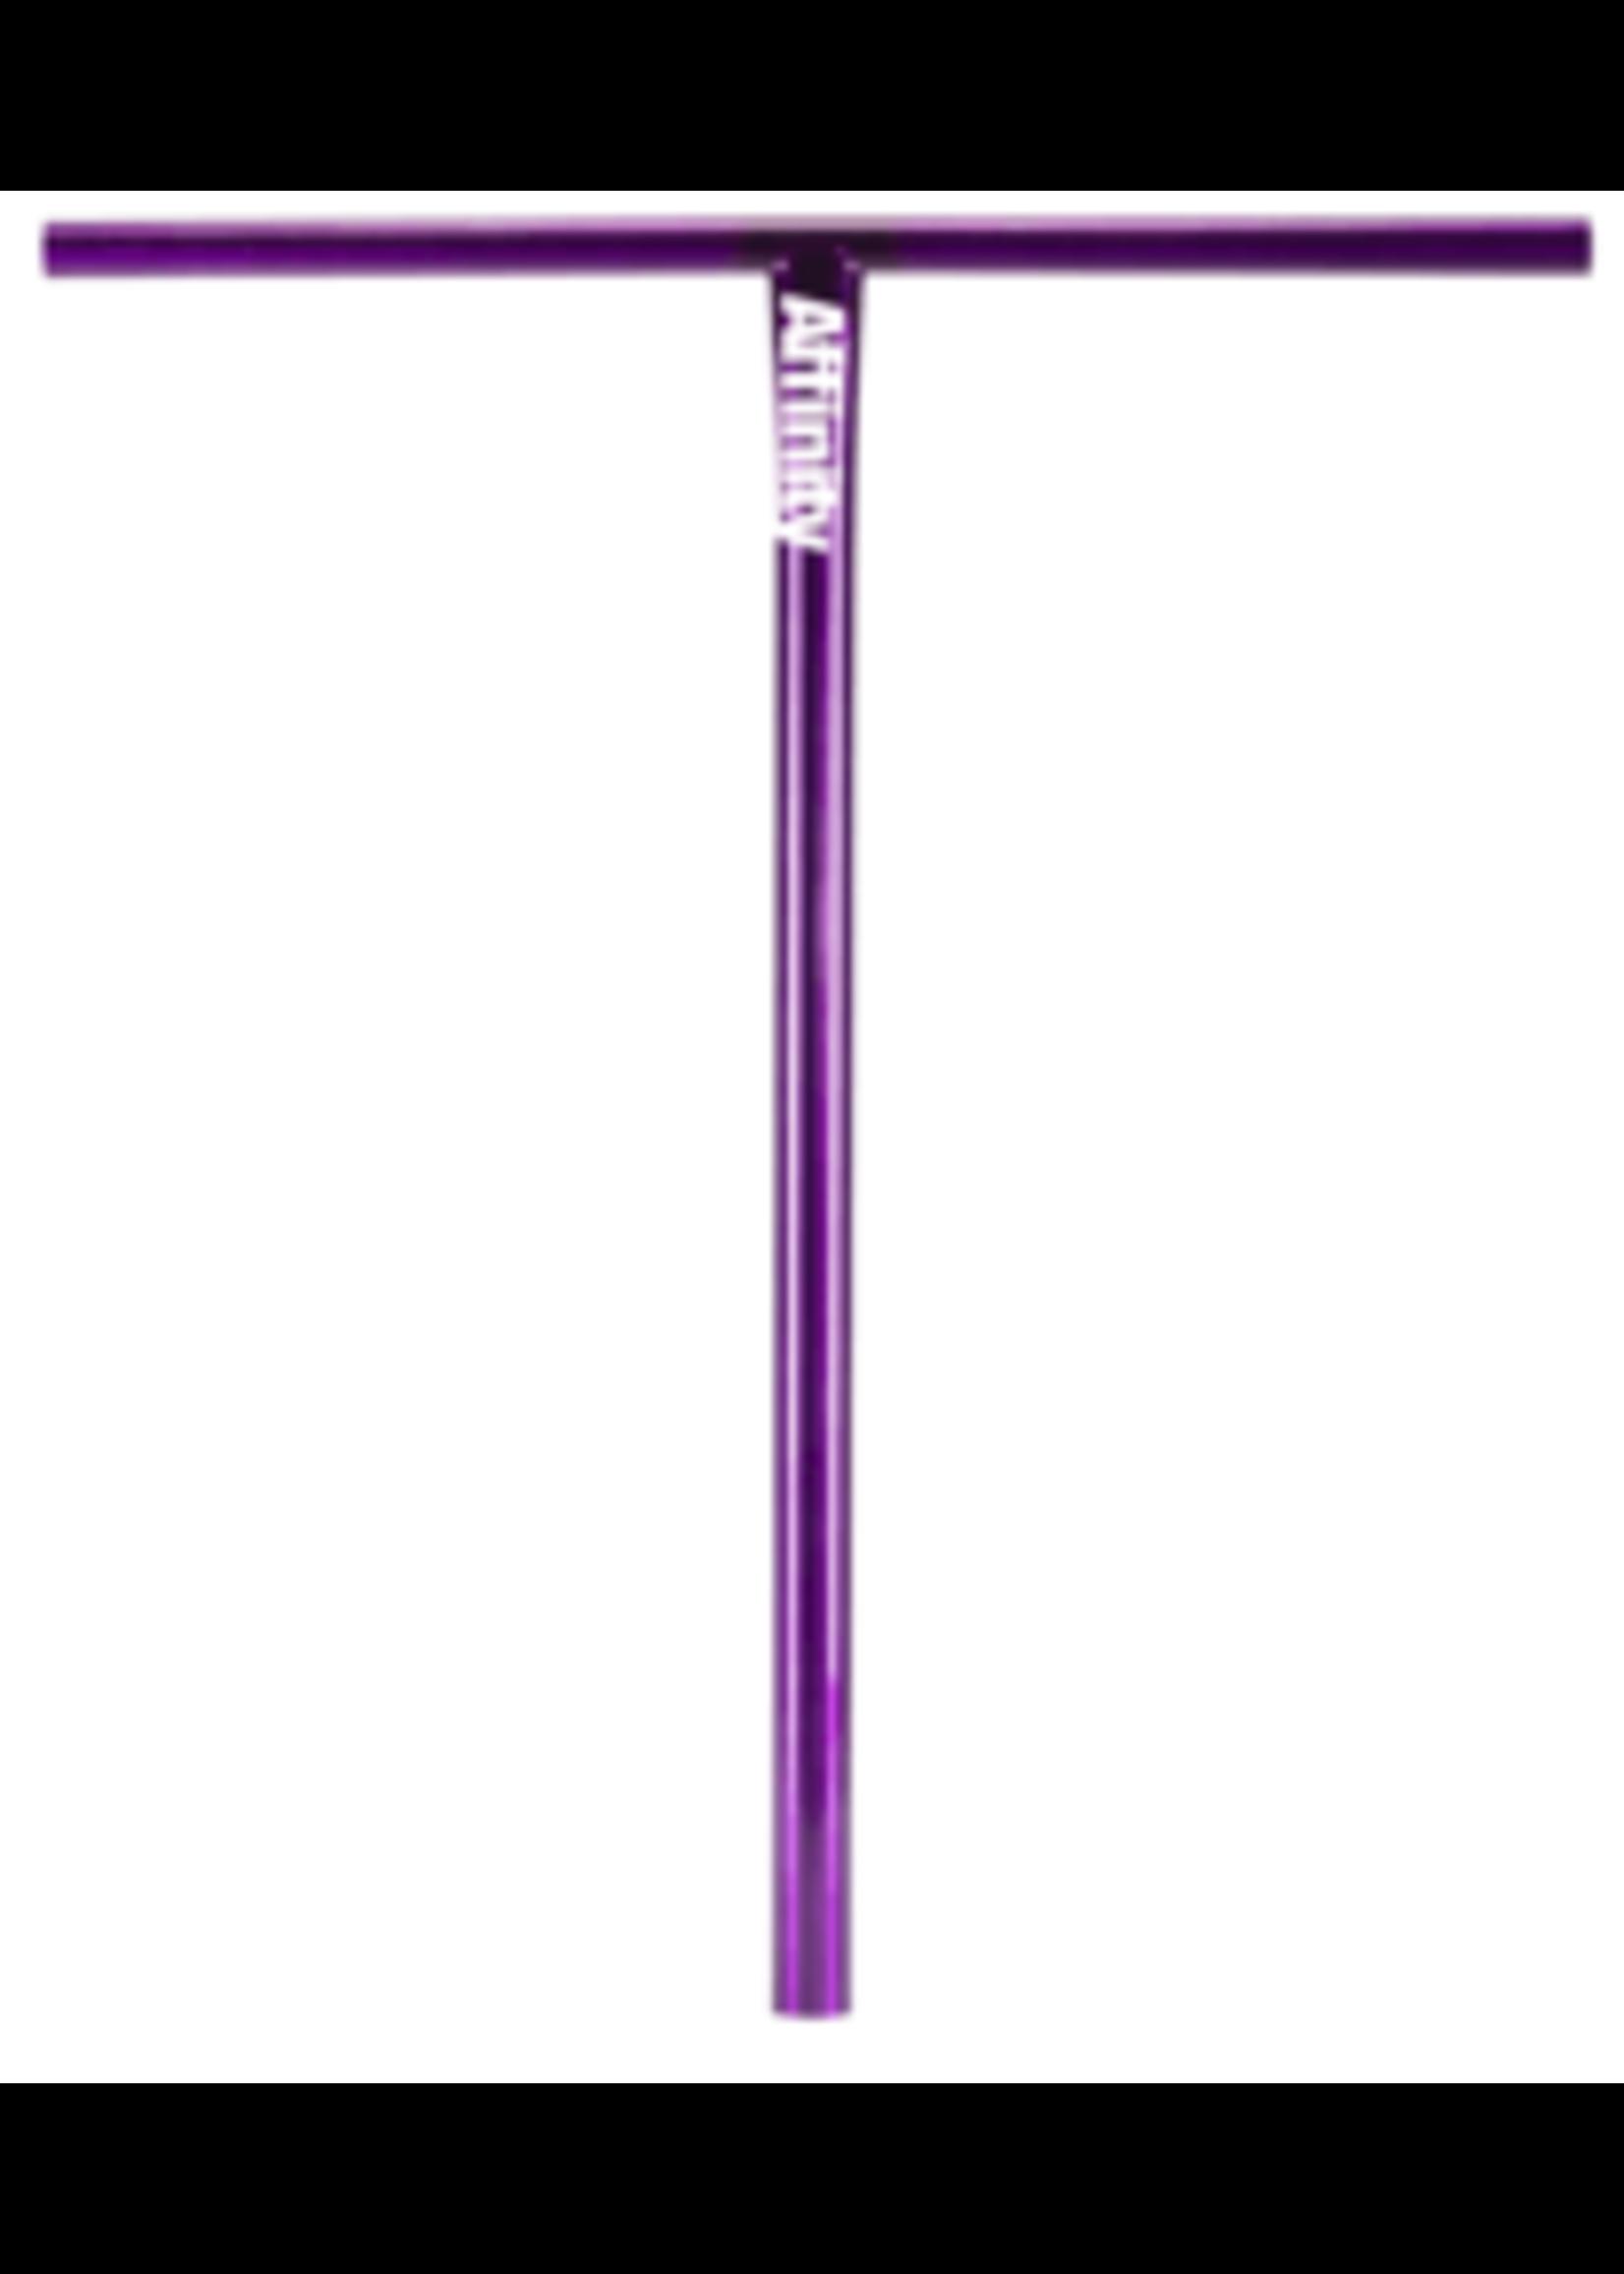 Affinity Affinity - Classic XL Tbar - Oversized